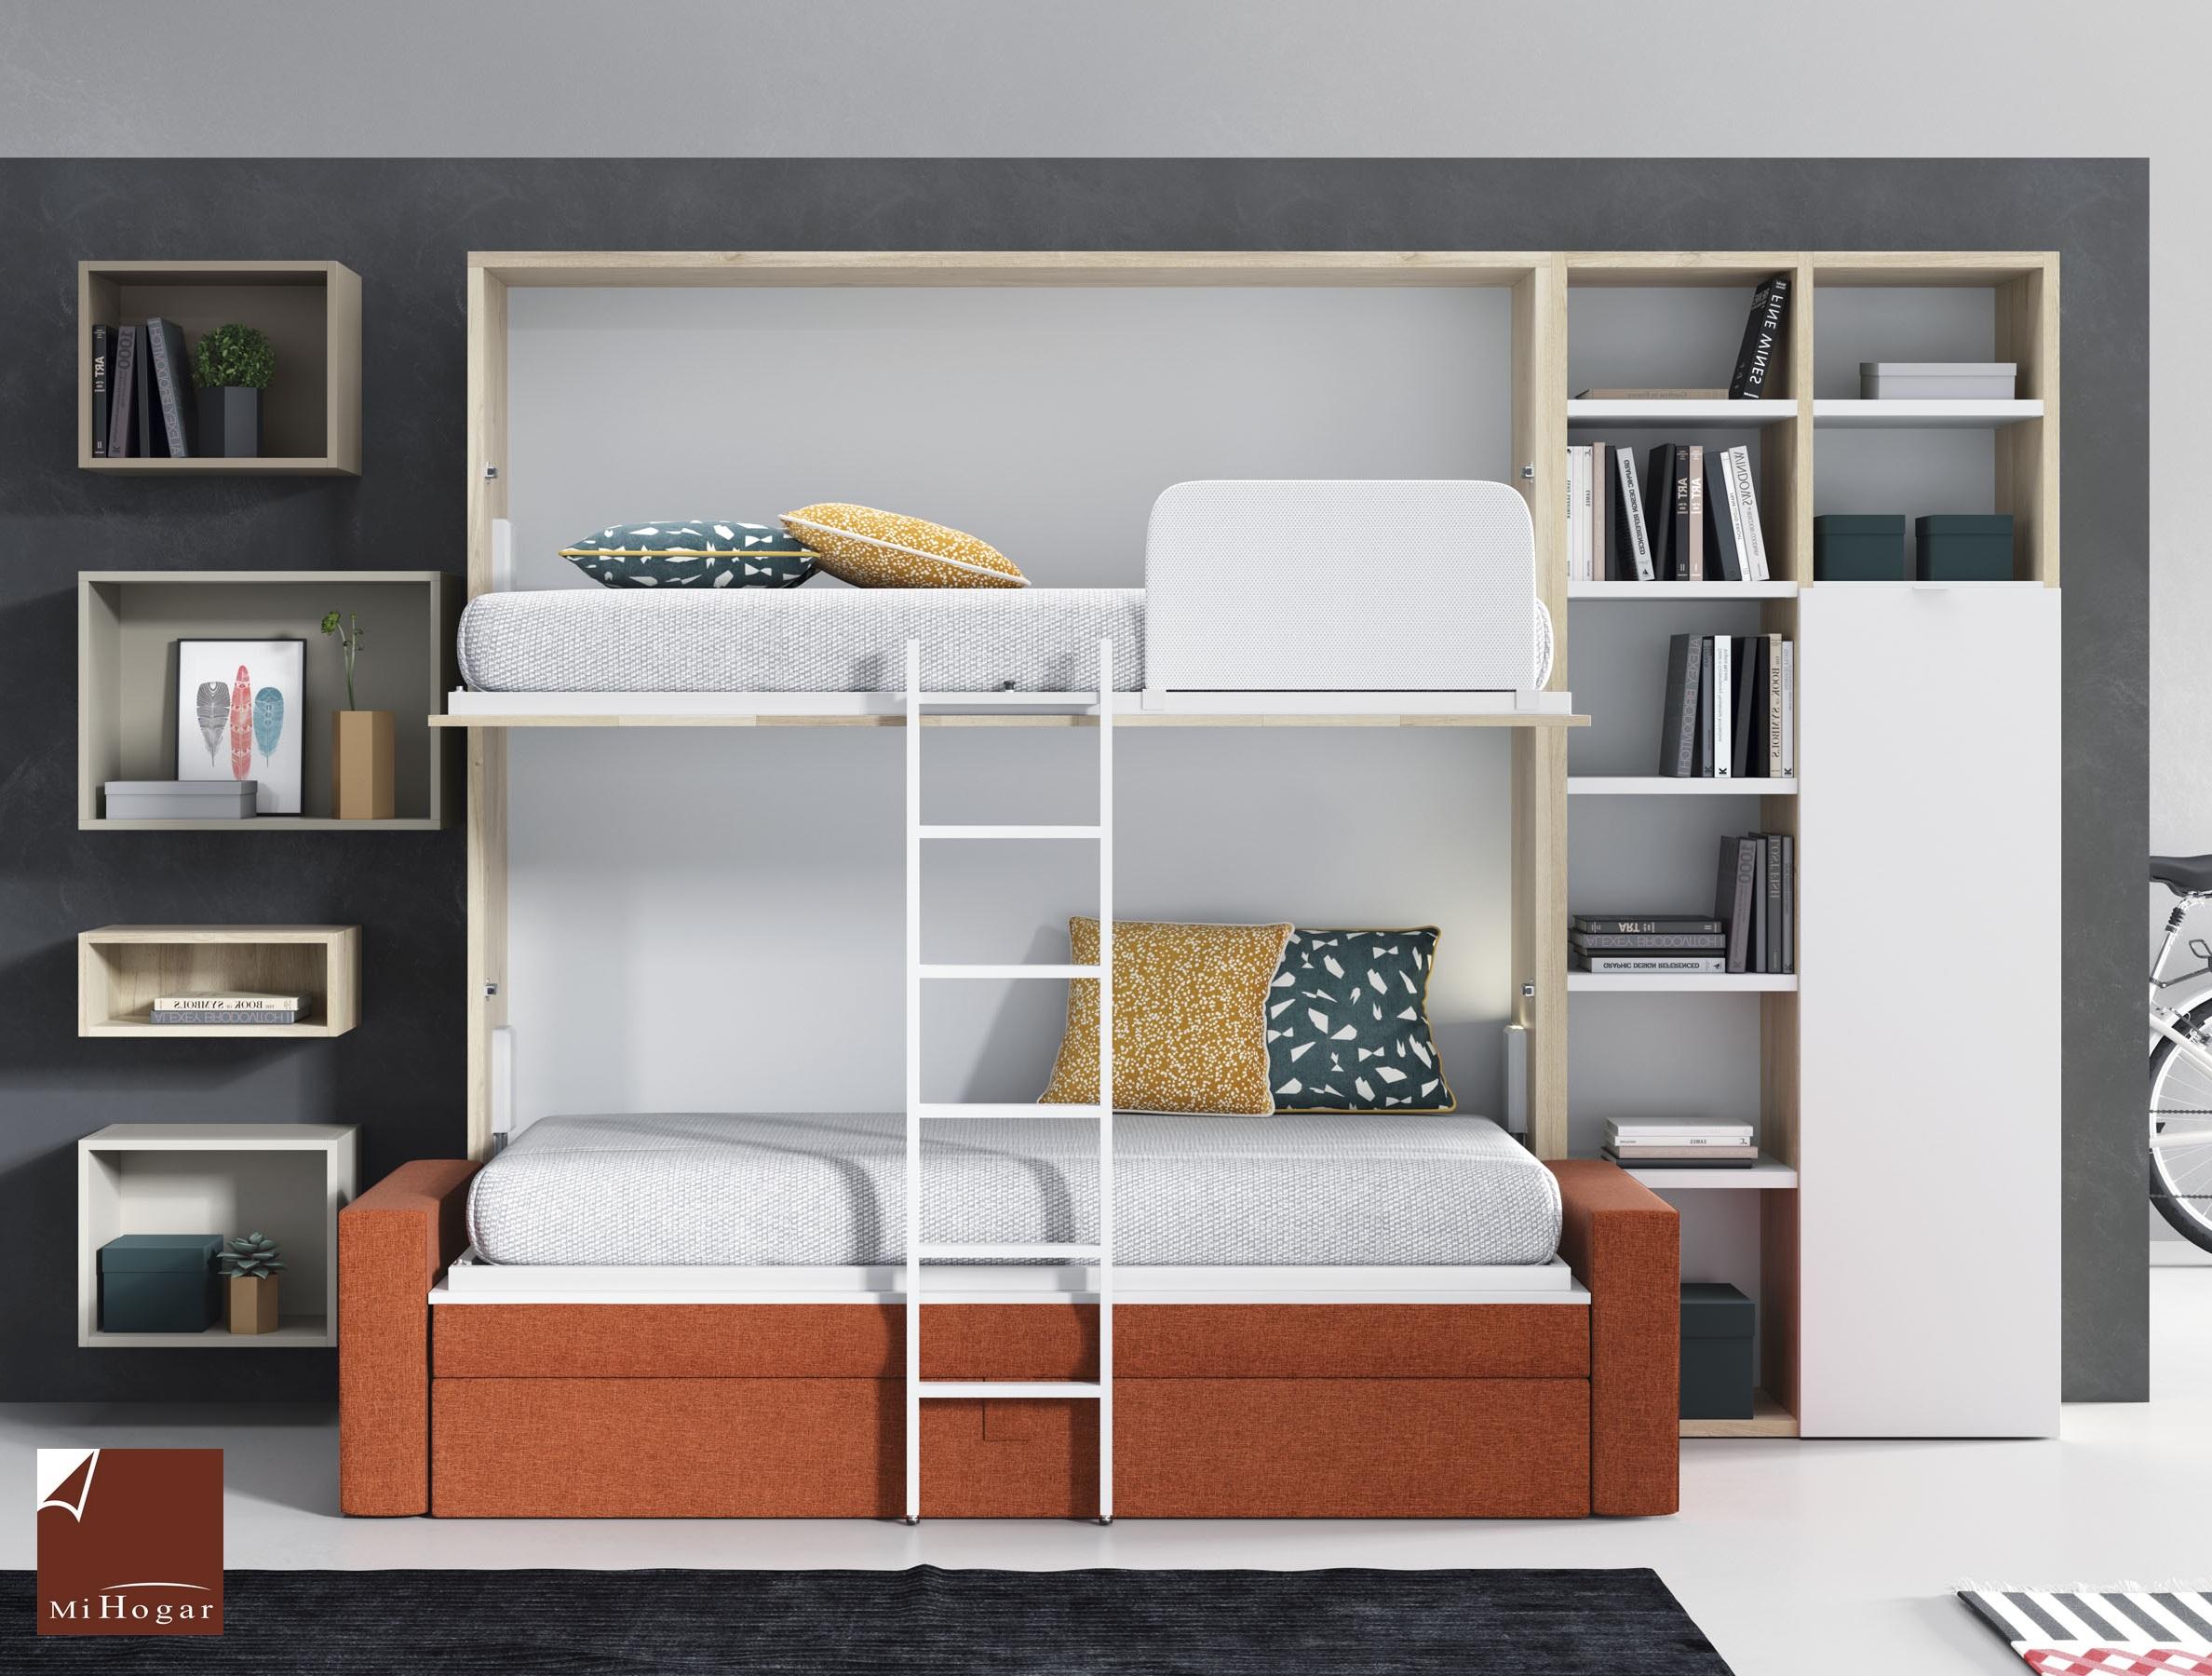 muebles semper calatayud obtenga ideas dise o de muebles